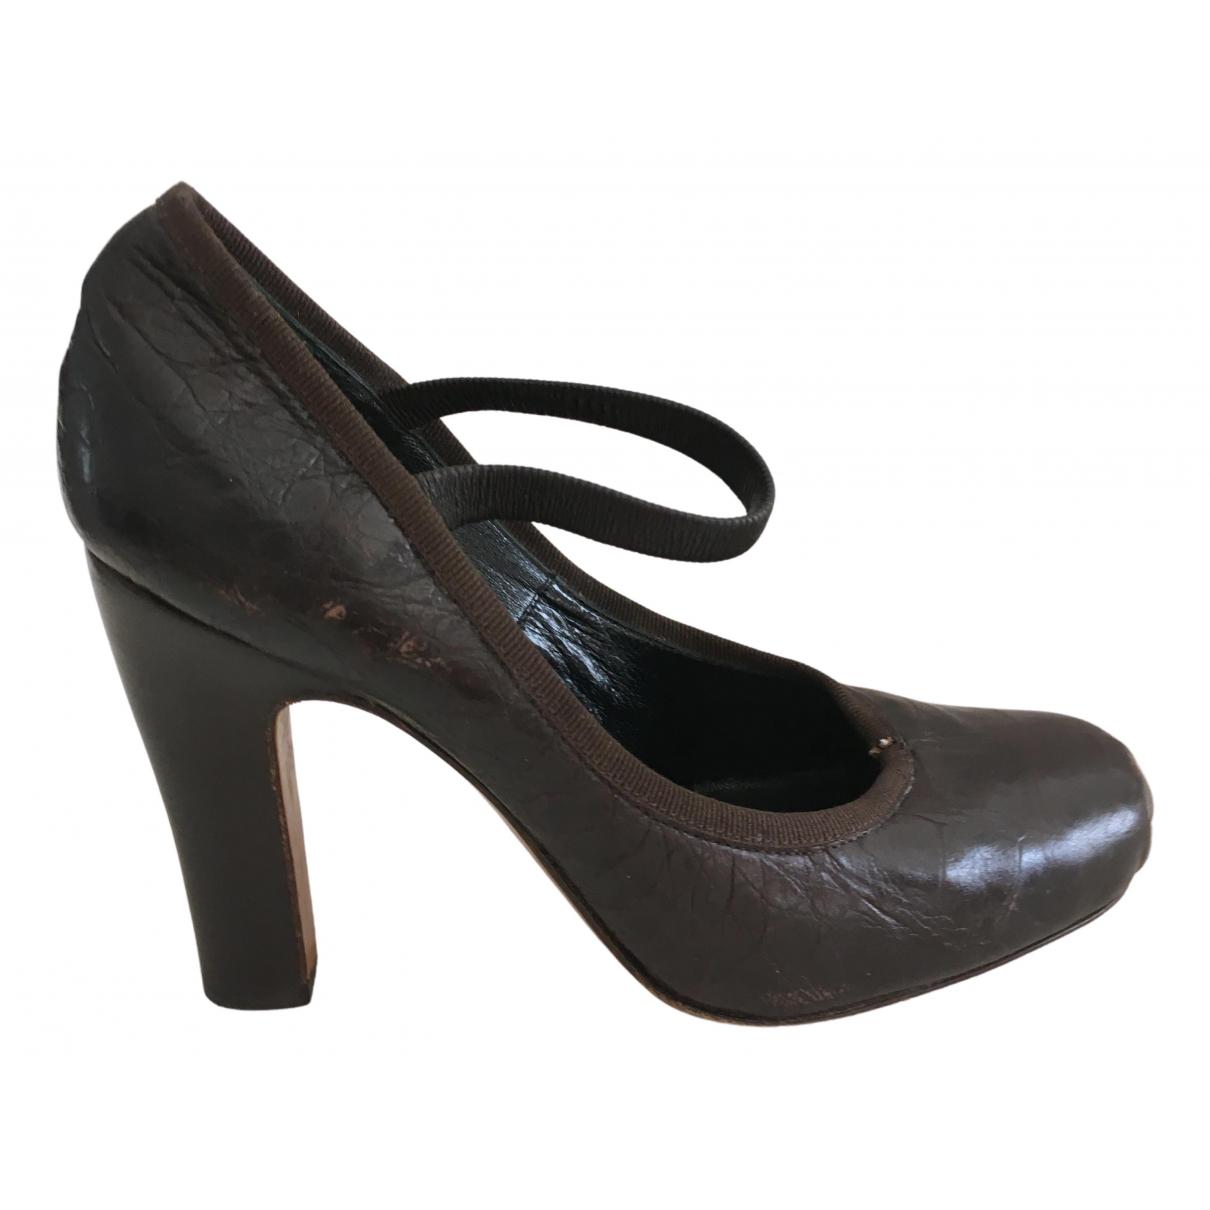 Dior N Brown Leather Heels for Women 35.5 EU